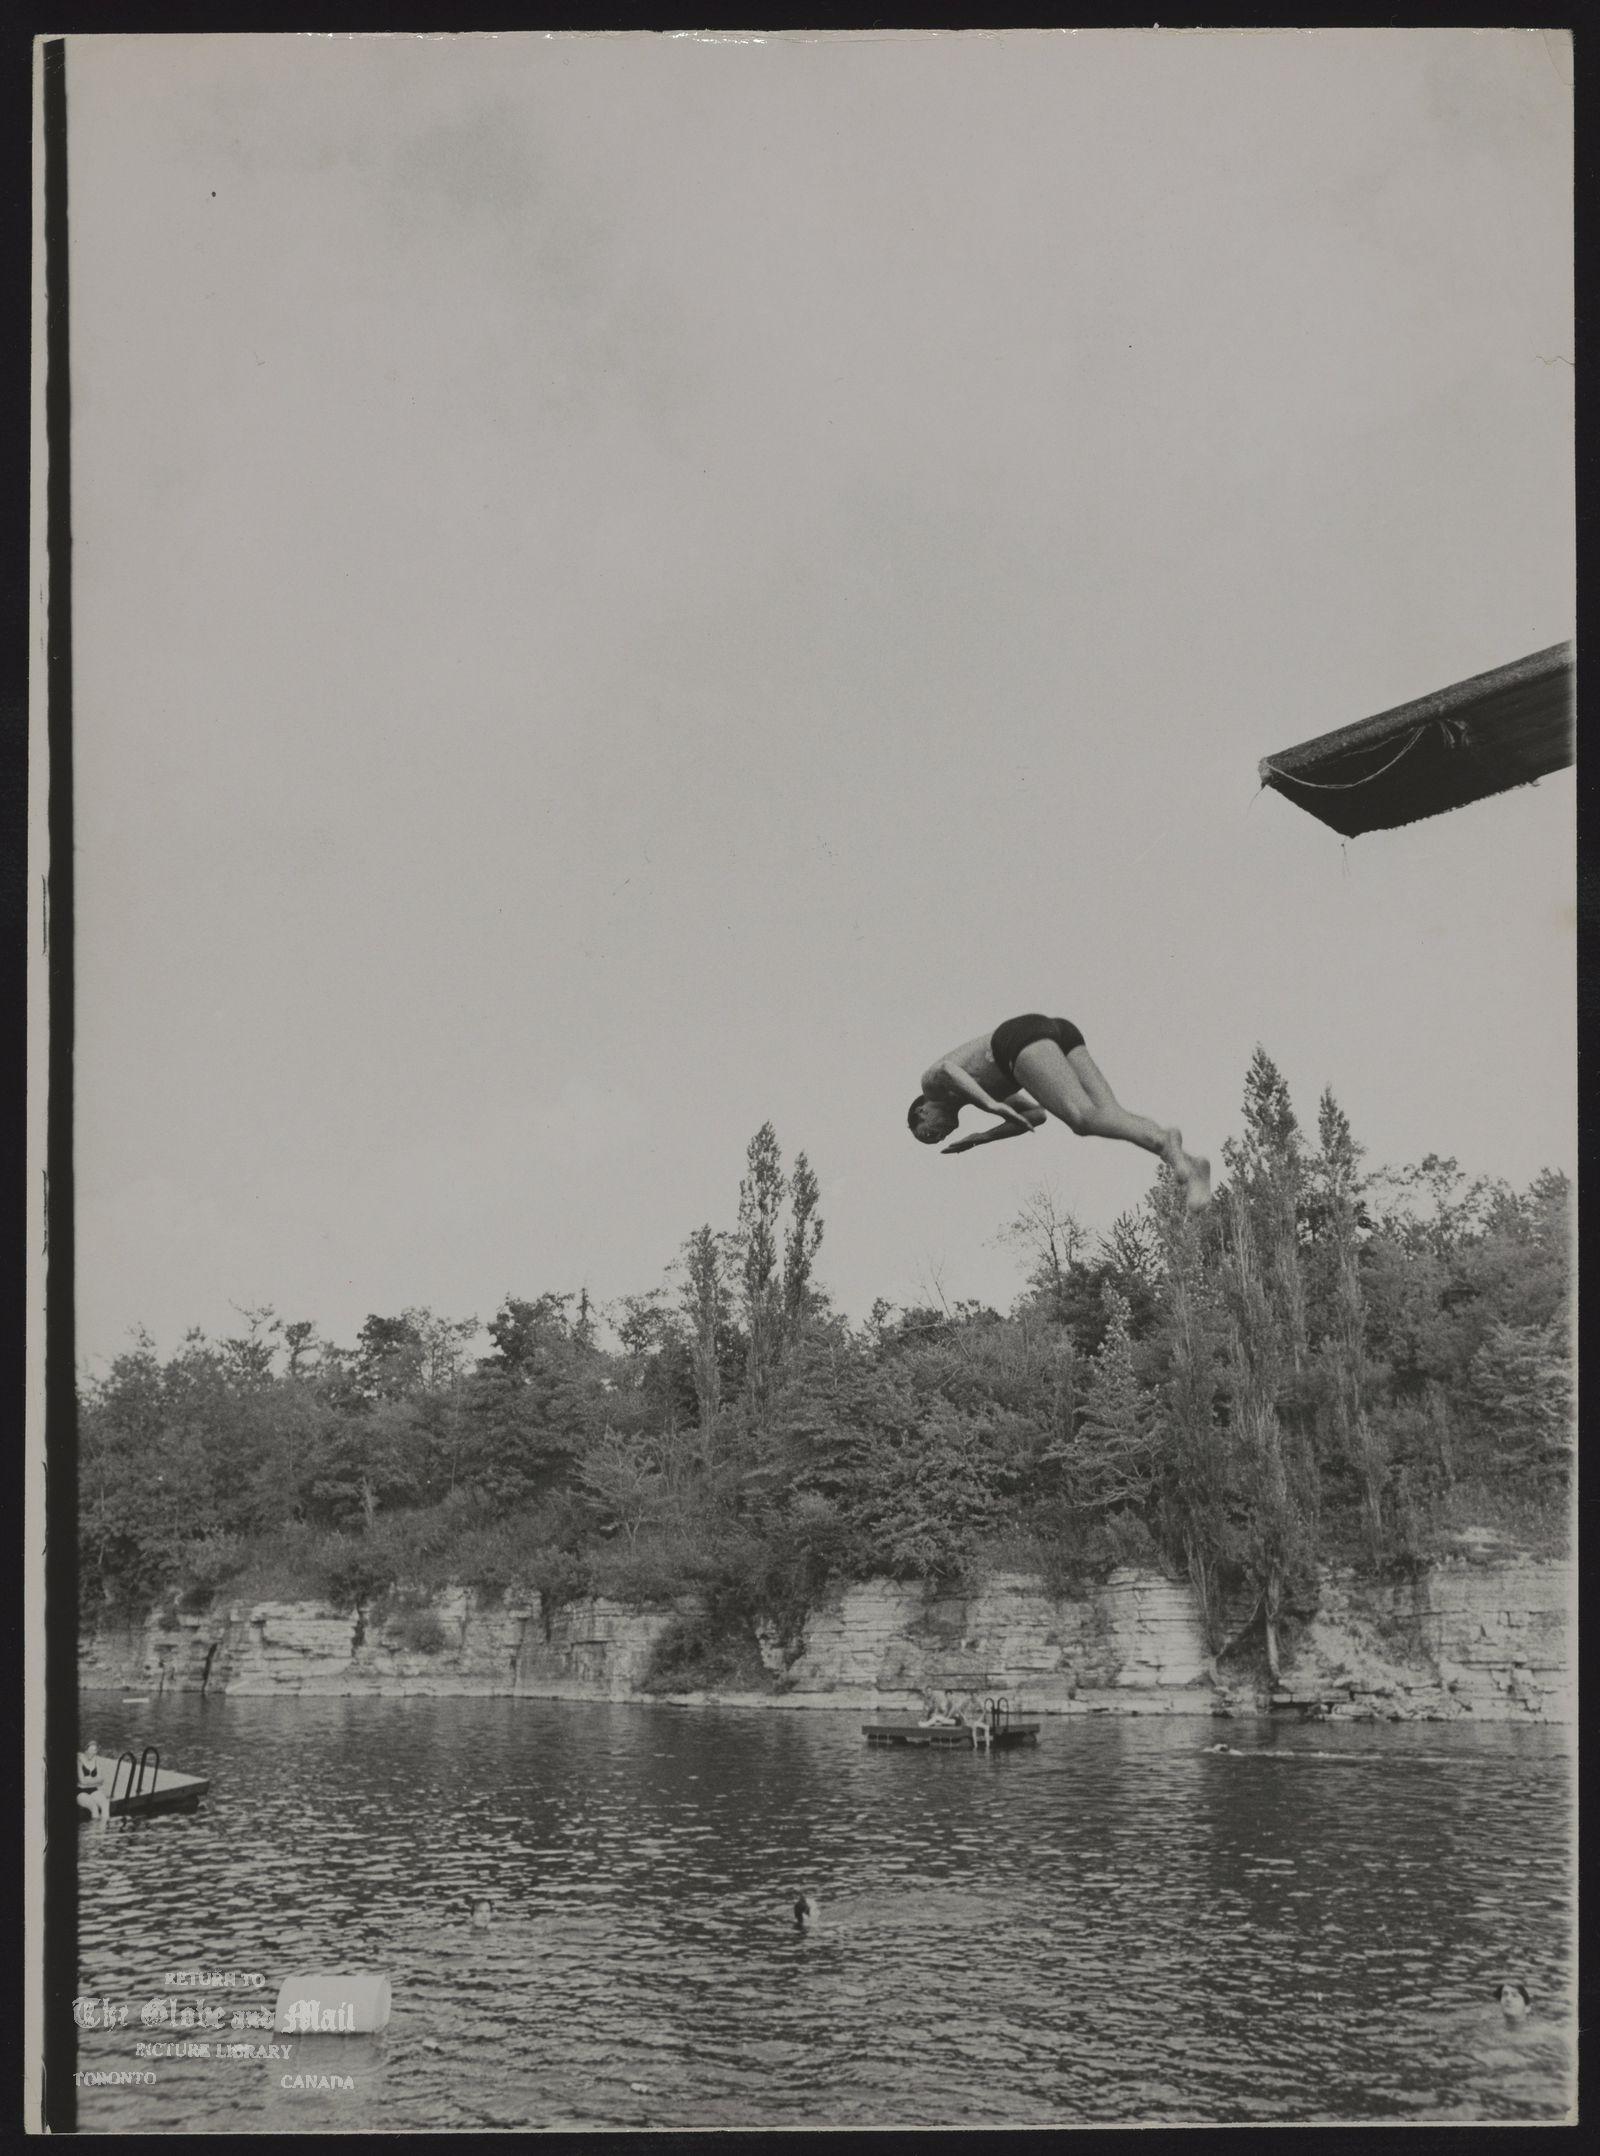 Pierre Elliott TRUDEAU Quebec. Politician (Misc.) Prime Minister Trudeau swimming in quarry at Stratford.